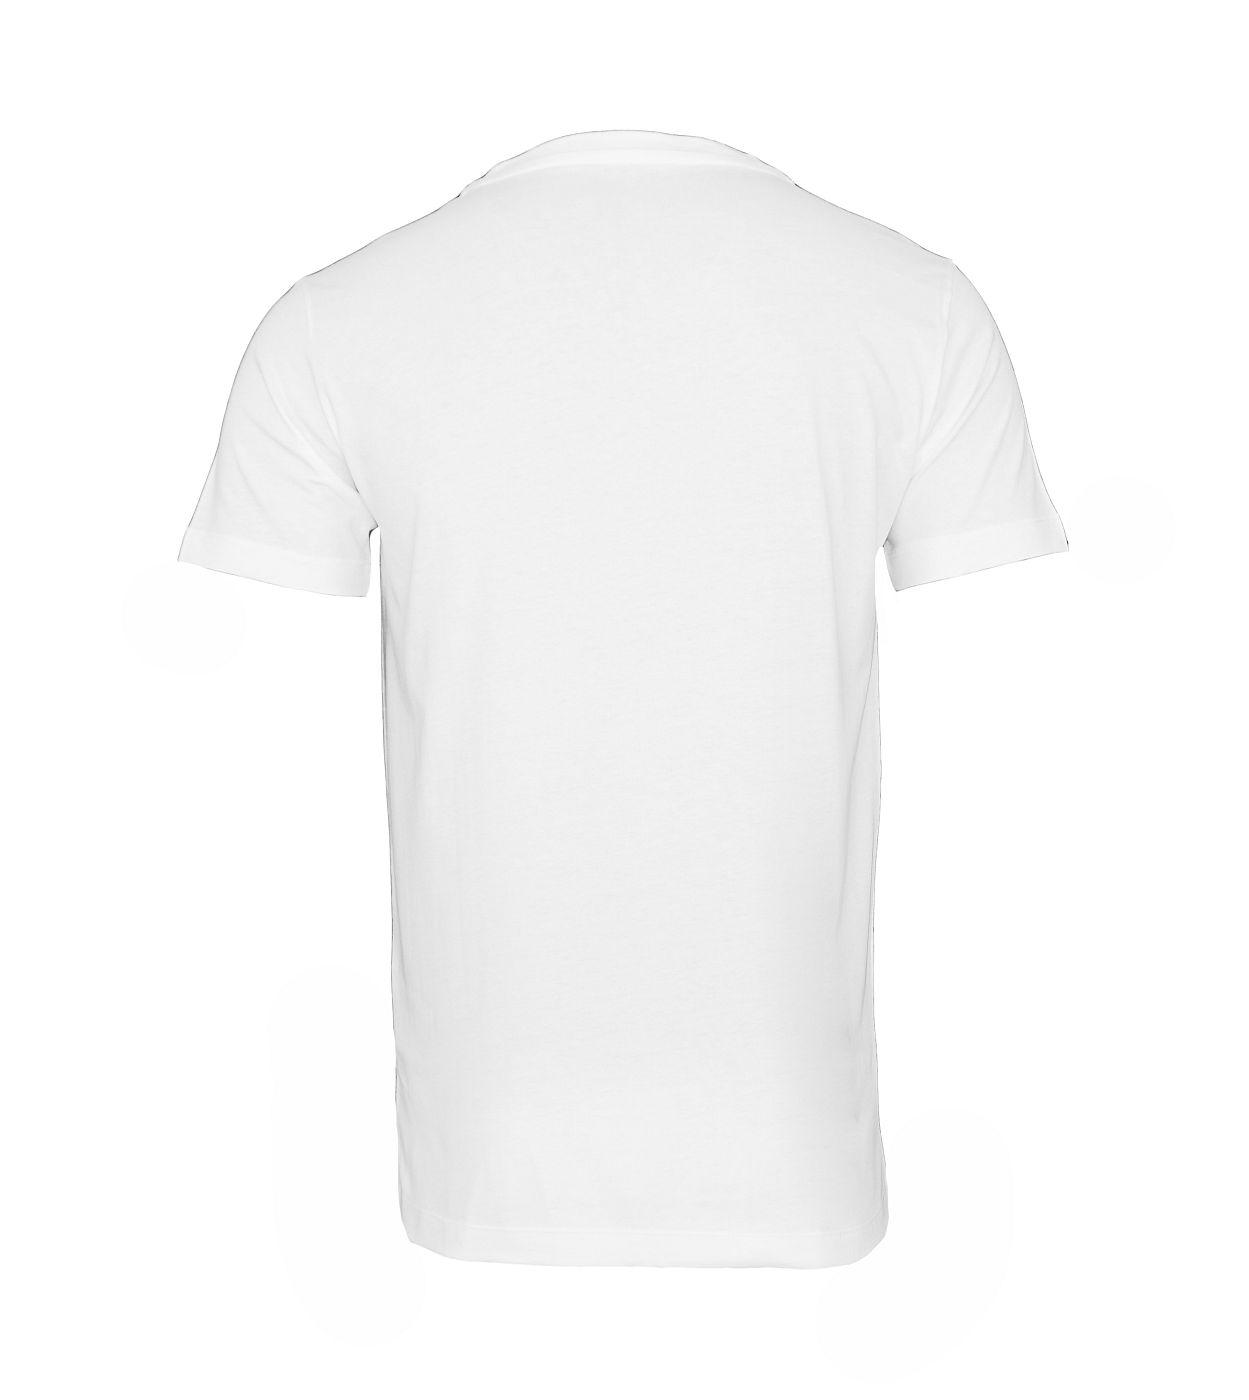 Replay 2er Pack T-Shirts V-Ausschnitt M3589 22602 010 white S18-RPT1